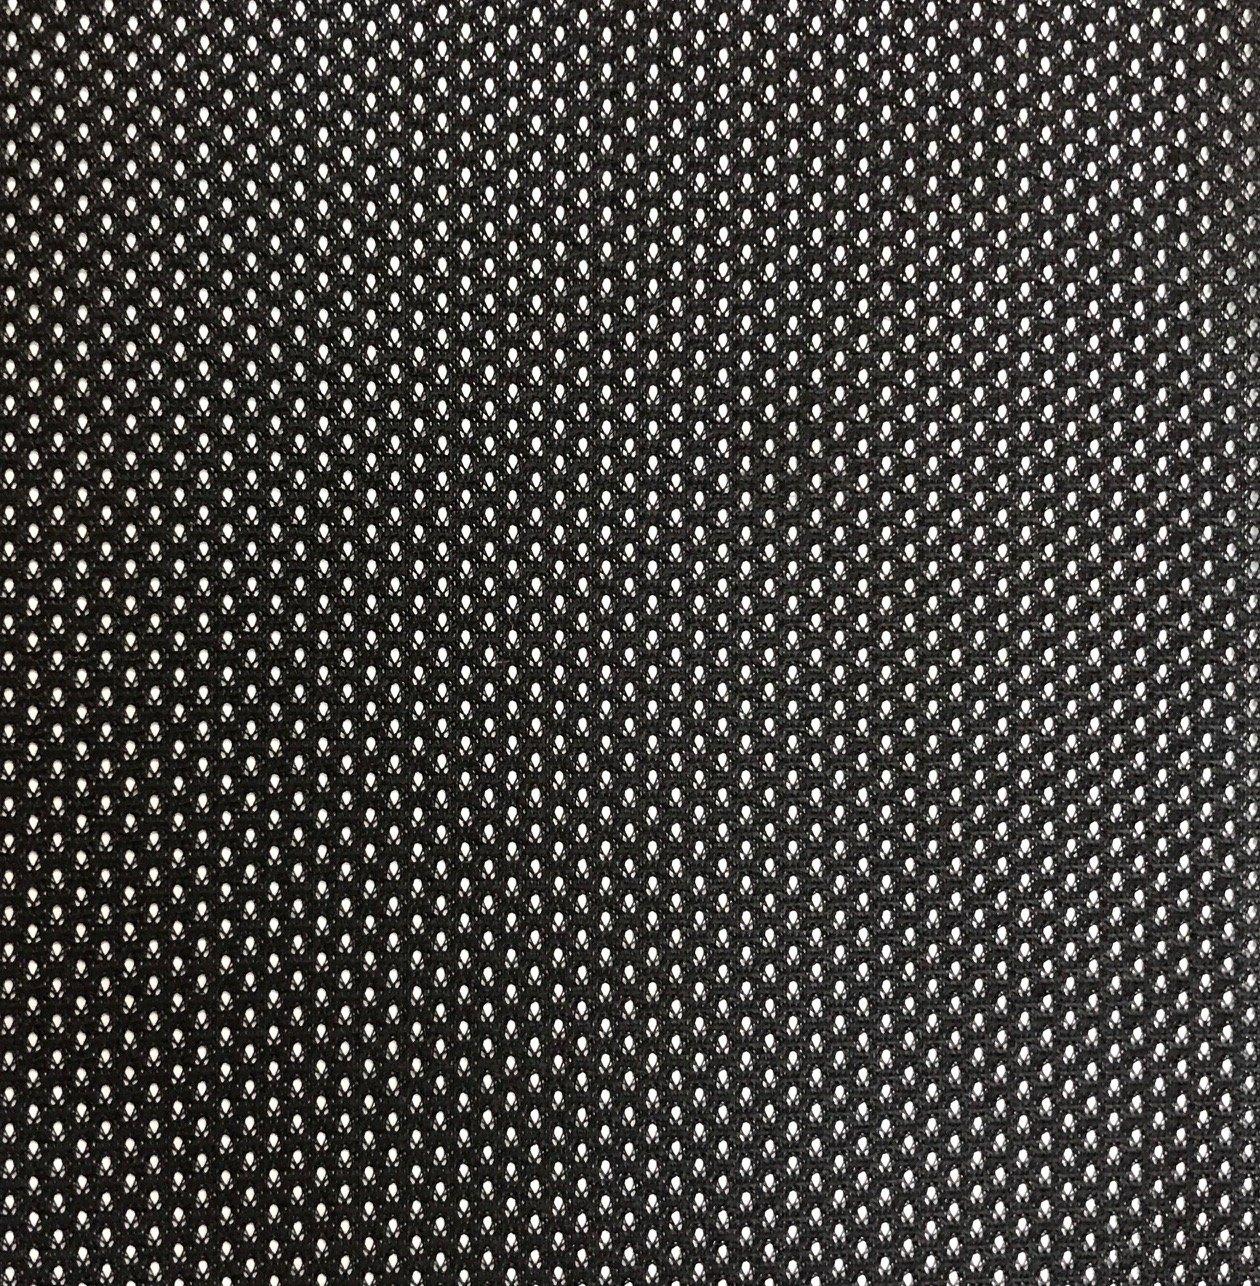 Micro Mesh - Black